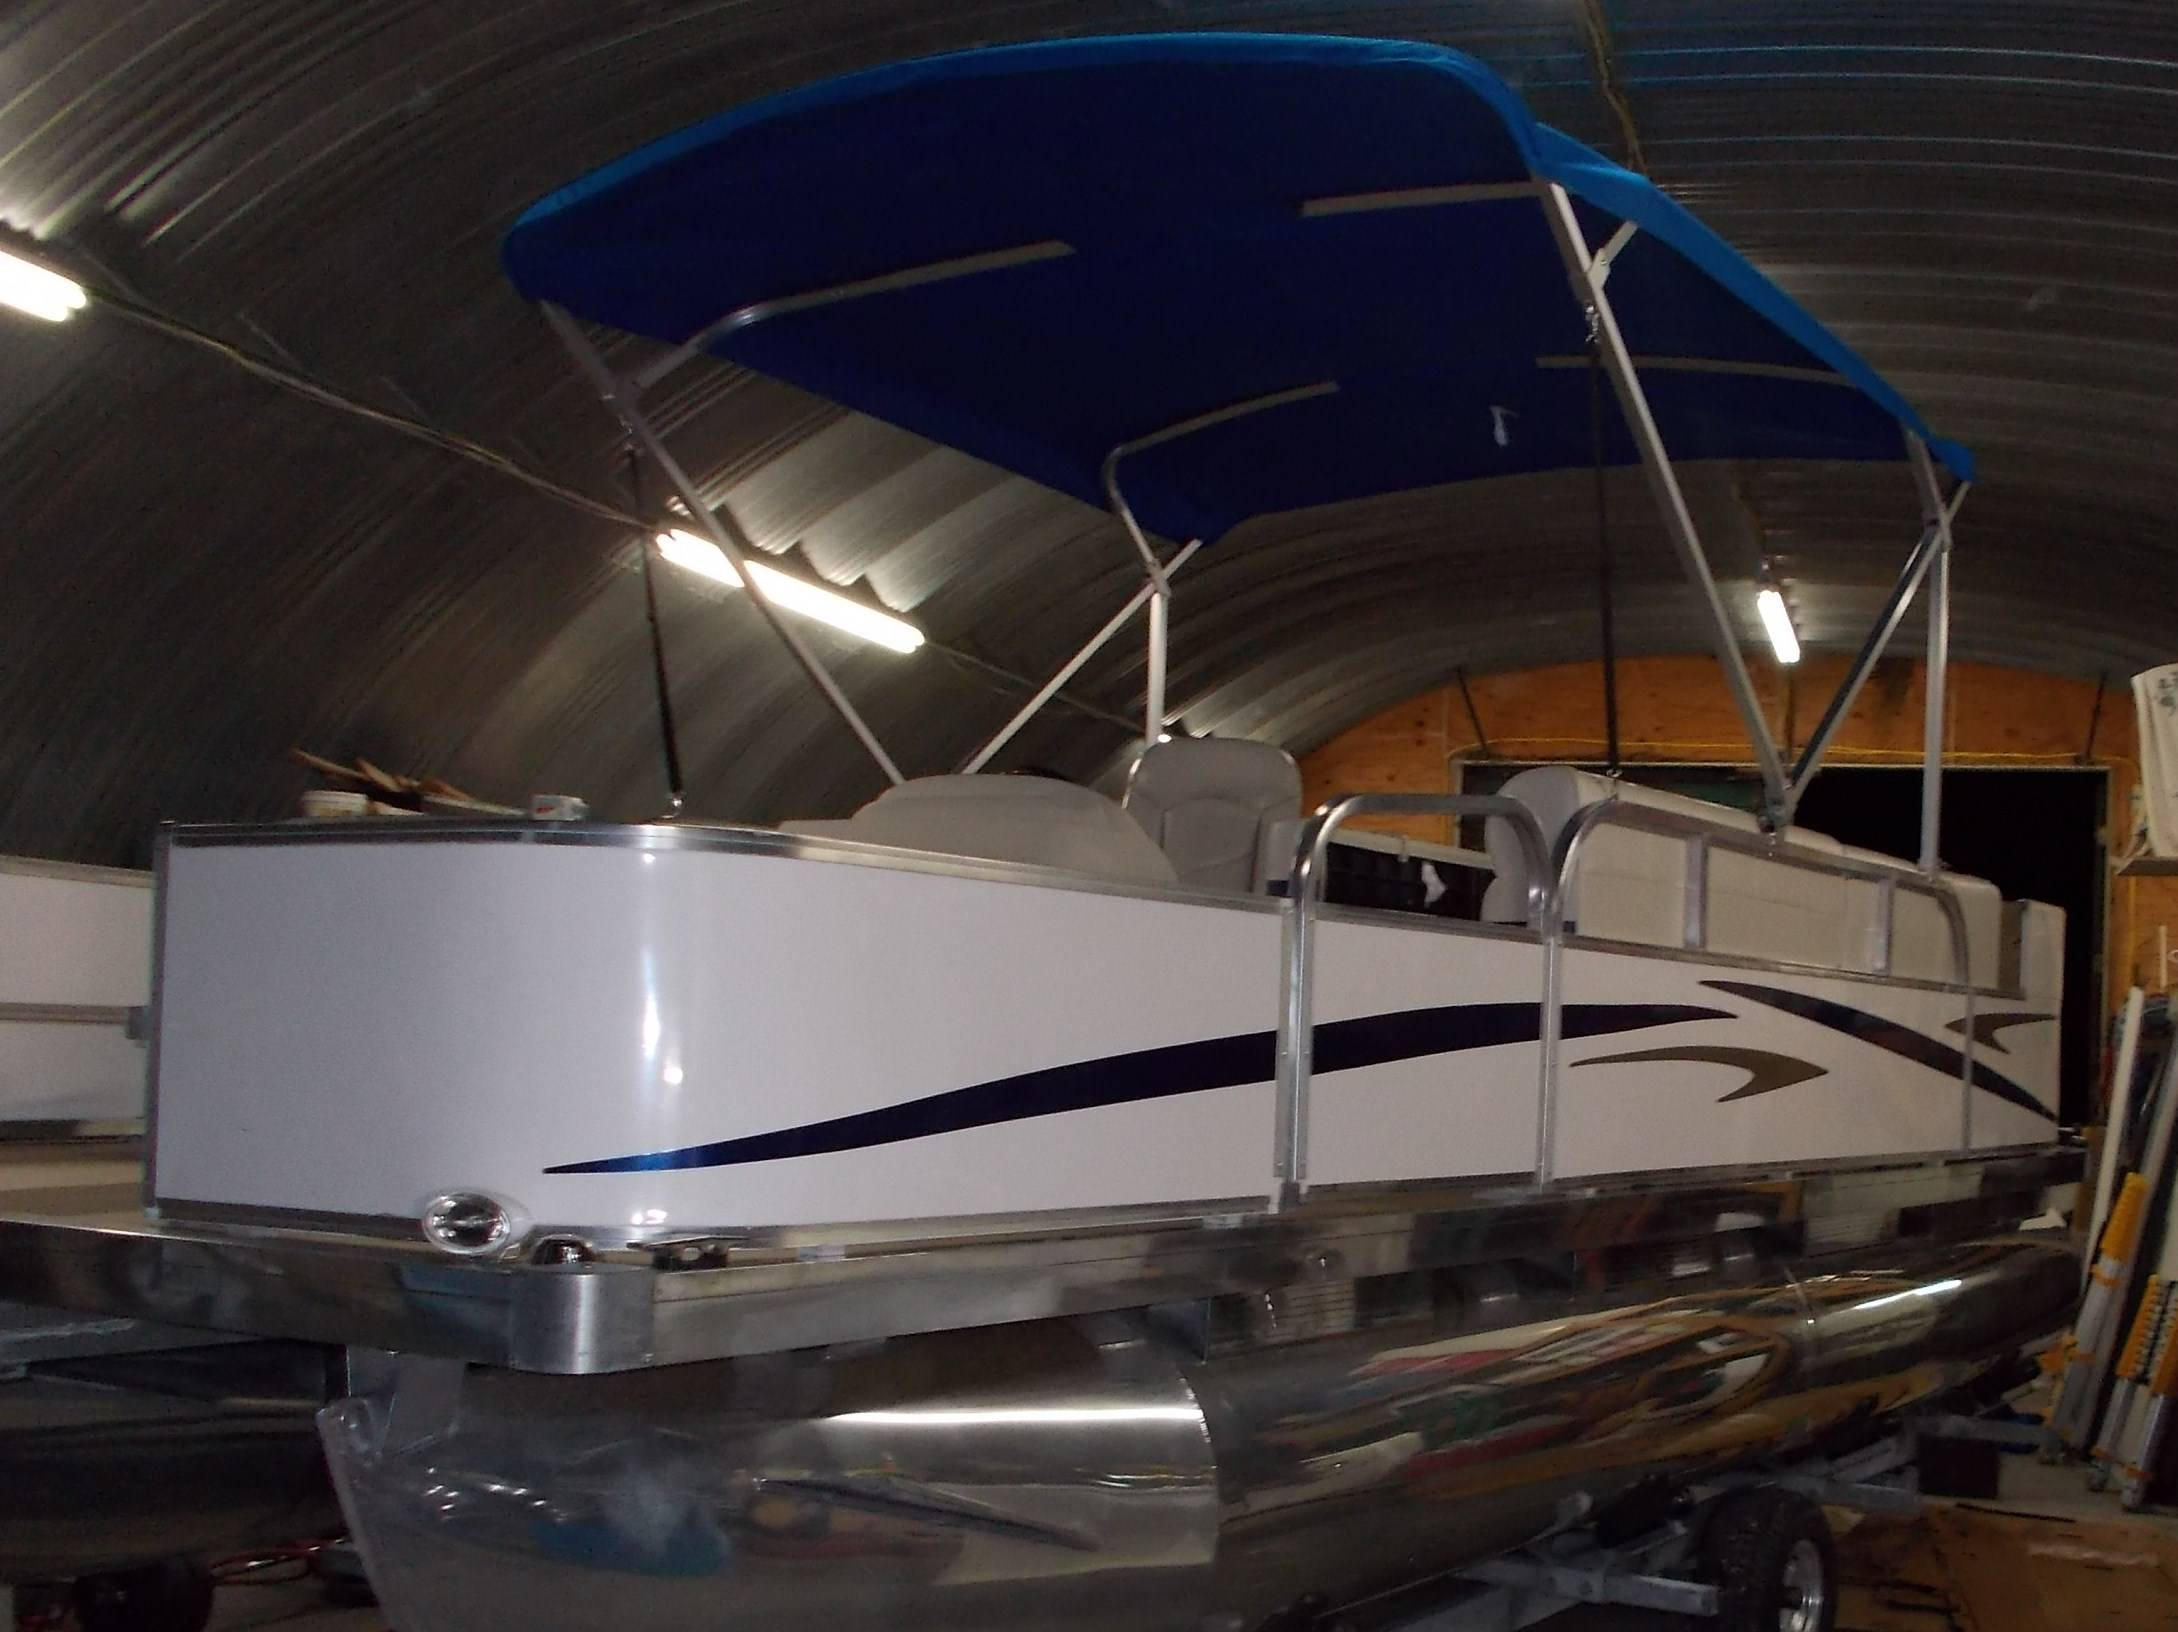 Panels Repaint Or Replace Pontoon Boat Amp Deck Boat Forum